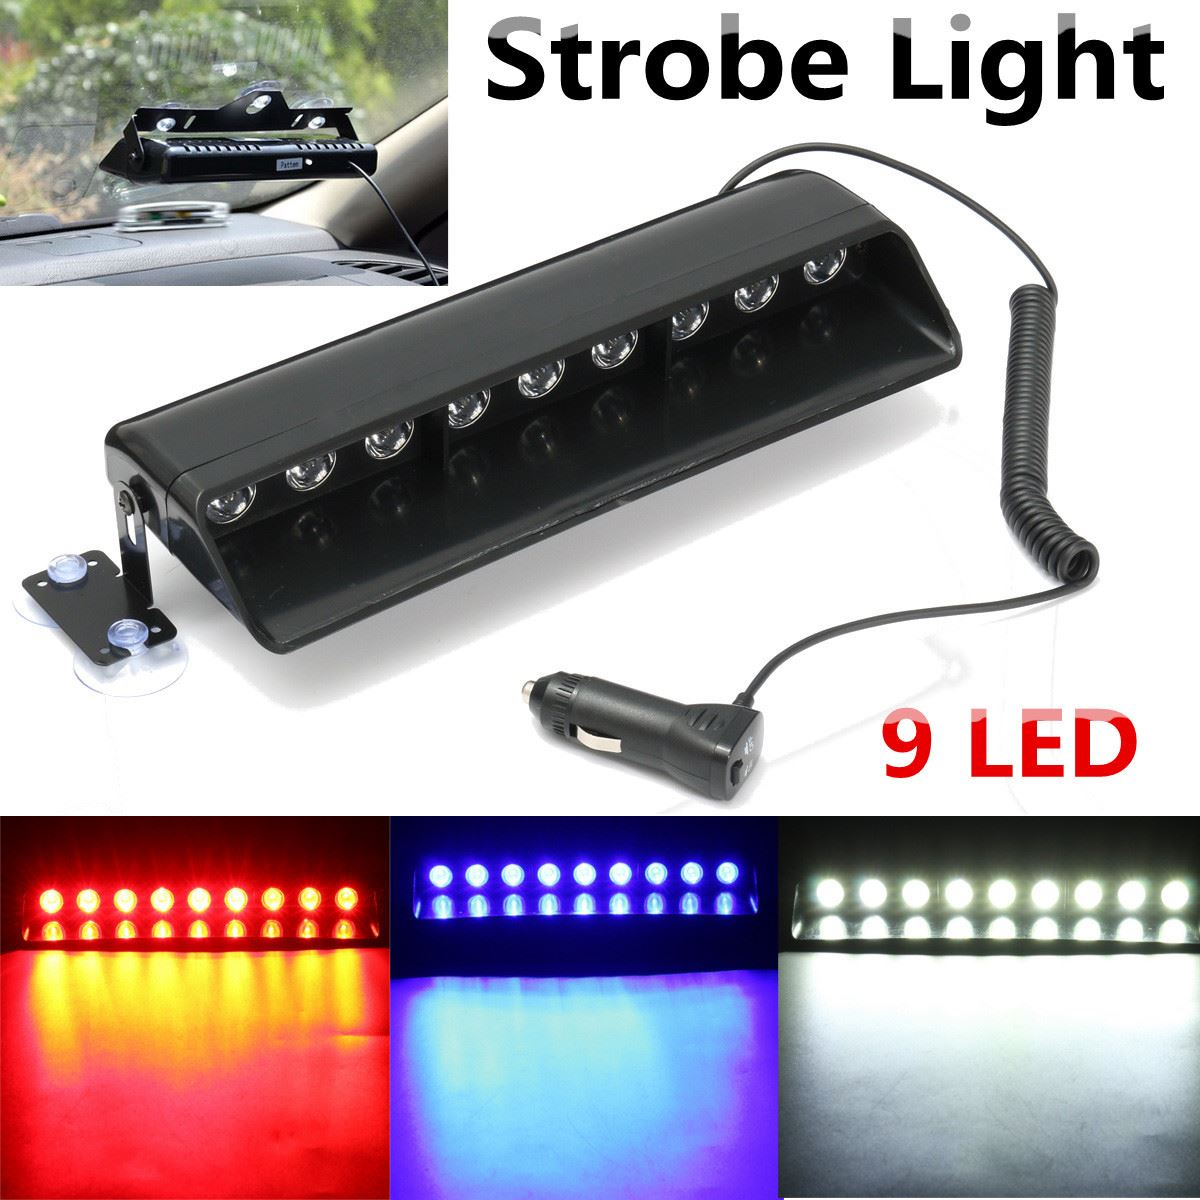 Universal 9 LED Car Emergency Beacon Warning Light Bar 12V LED Dash Strobe Flash Light Hazard SUV Offroad Truck Boat